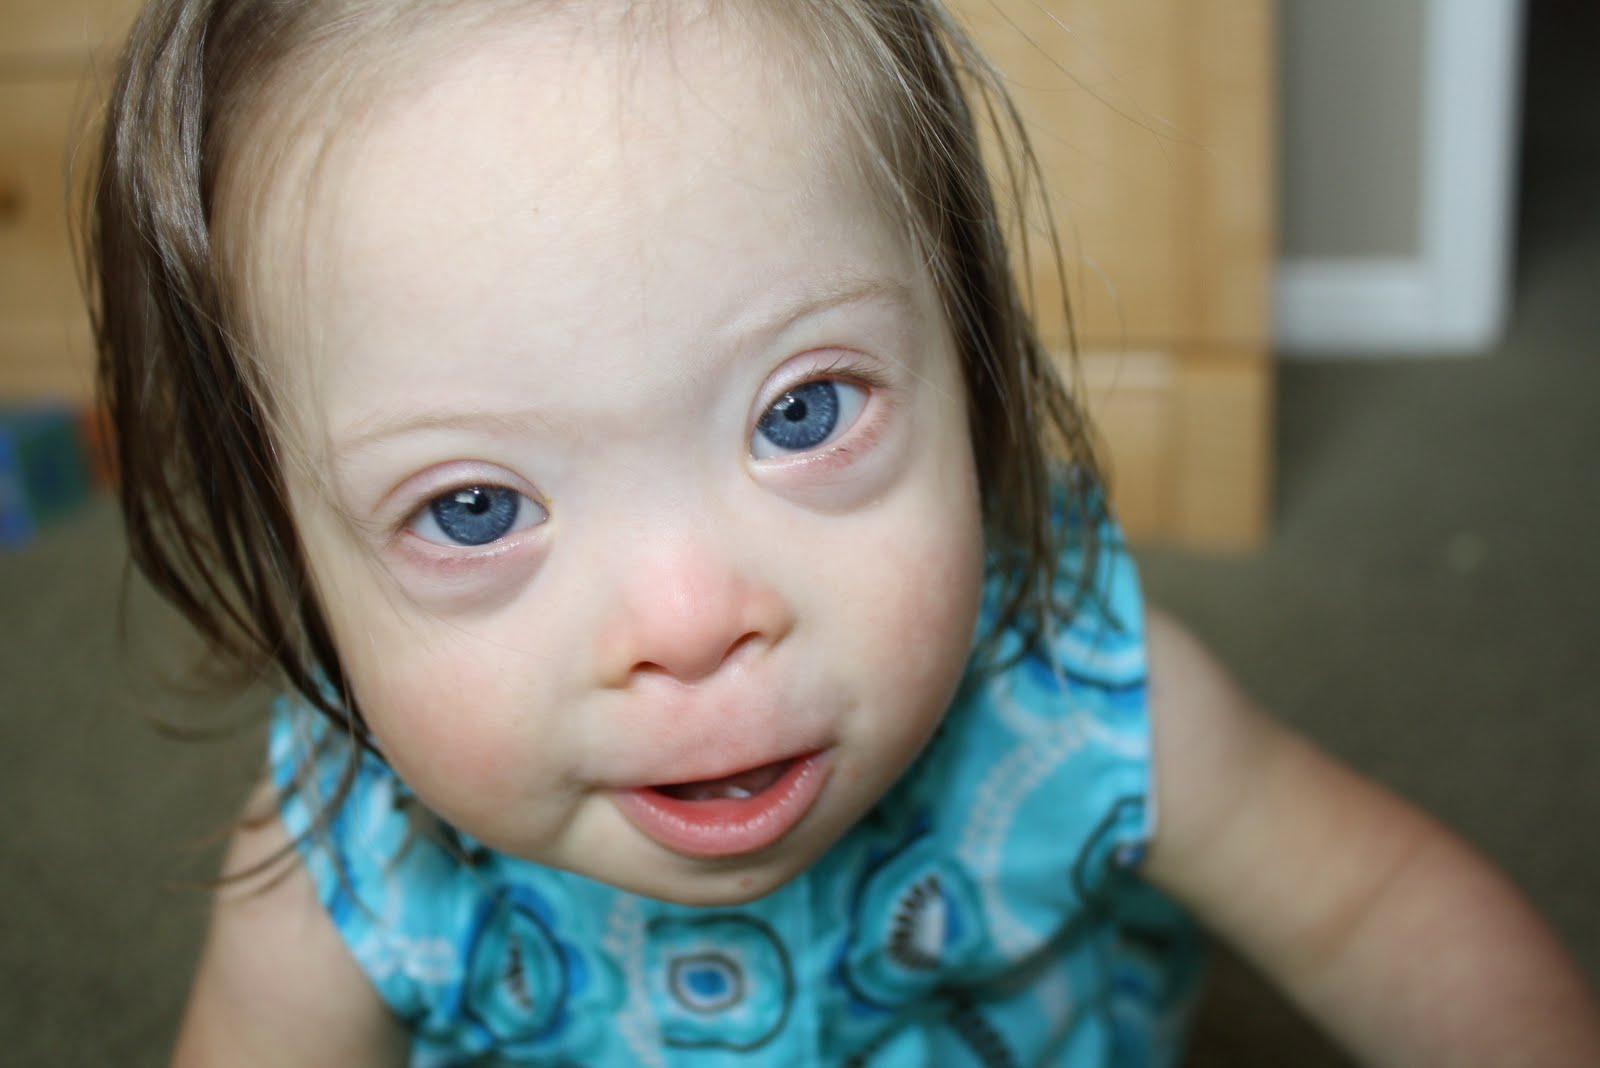 Jaxsons Fight: Sleep apnea and Down syndrome